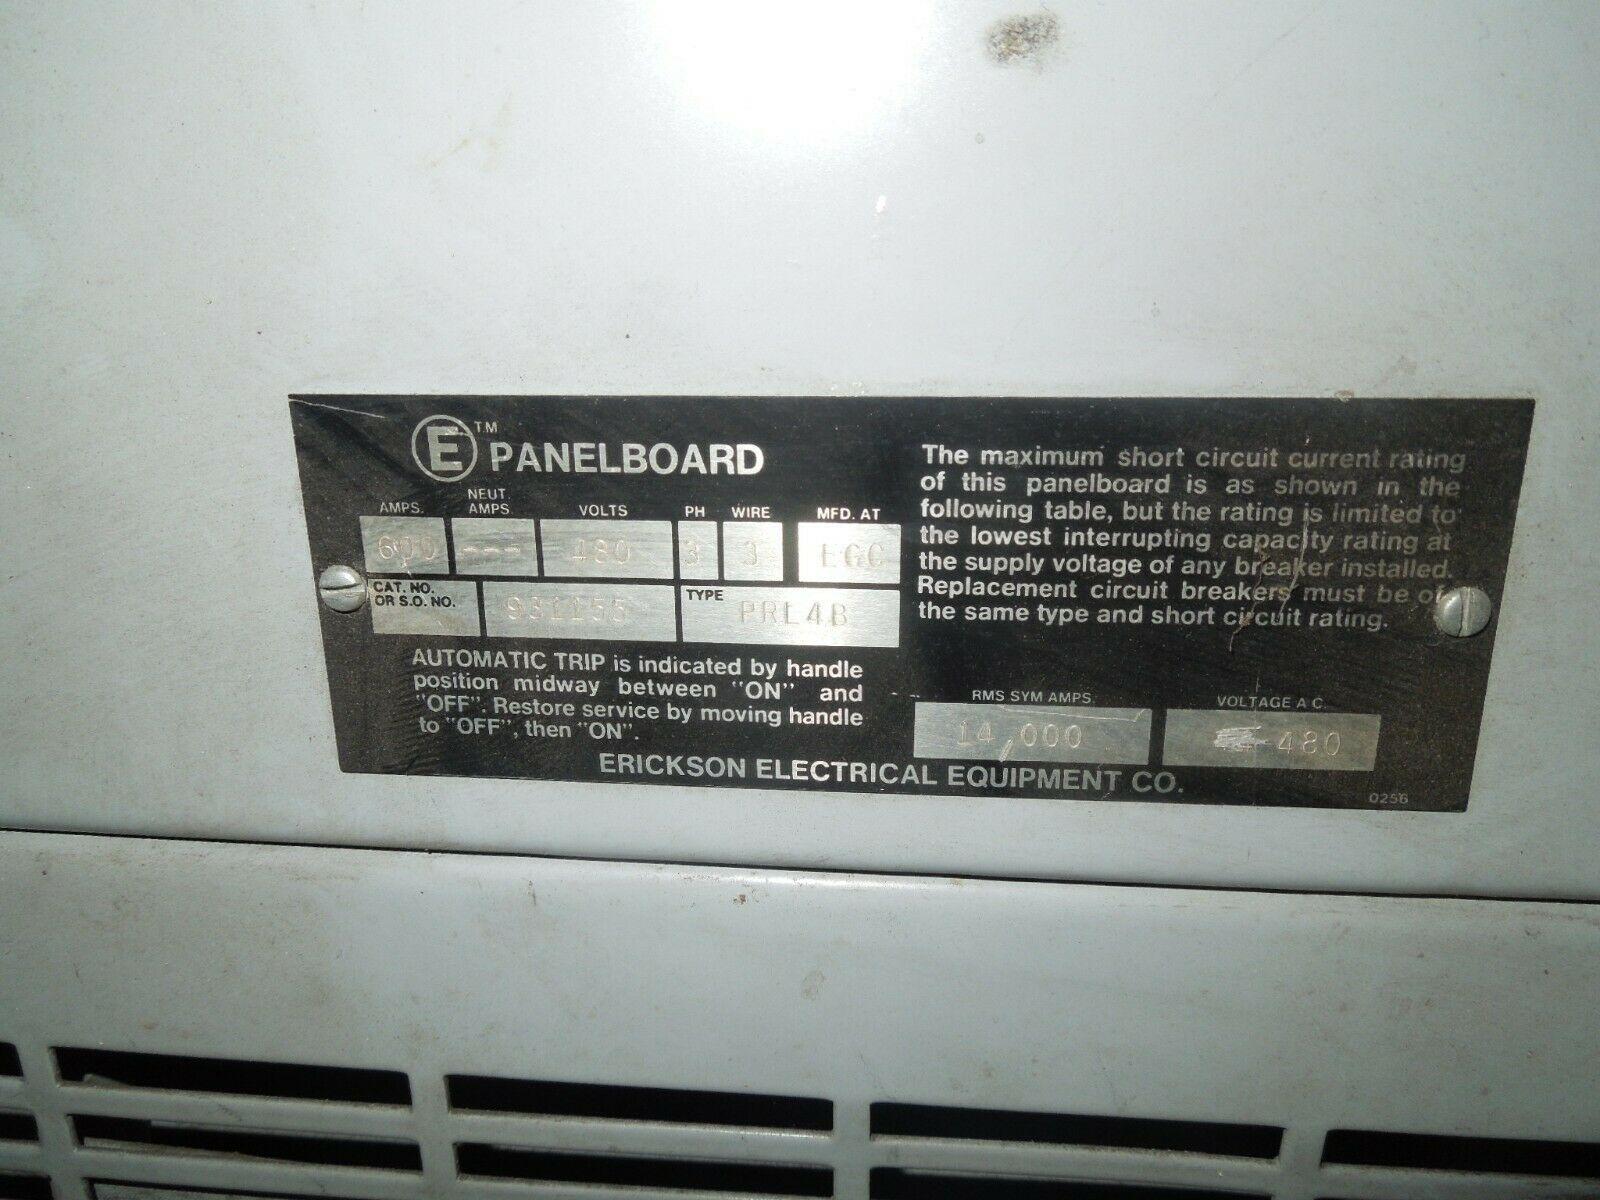 Erickson PRL4B E Panelboard 600A 3ph 3W 480V MLO Breaker Panel w/ Distribution - $3,725.00